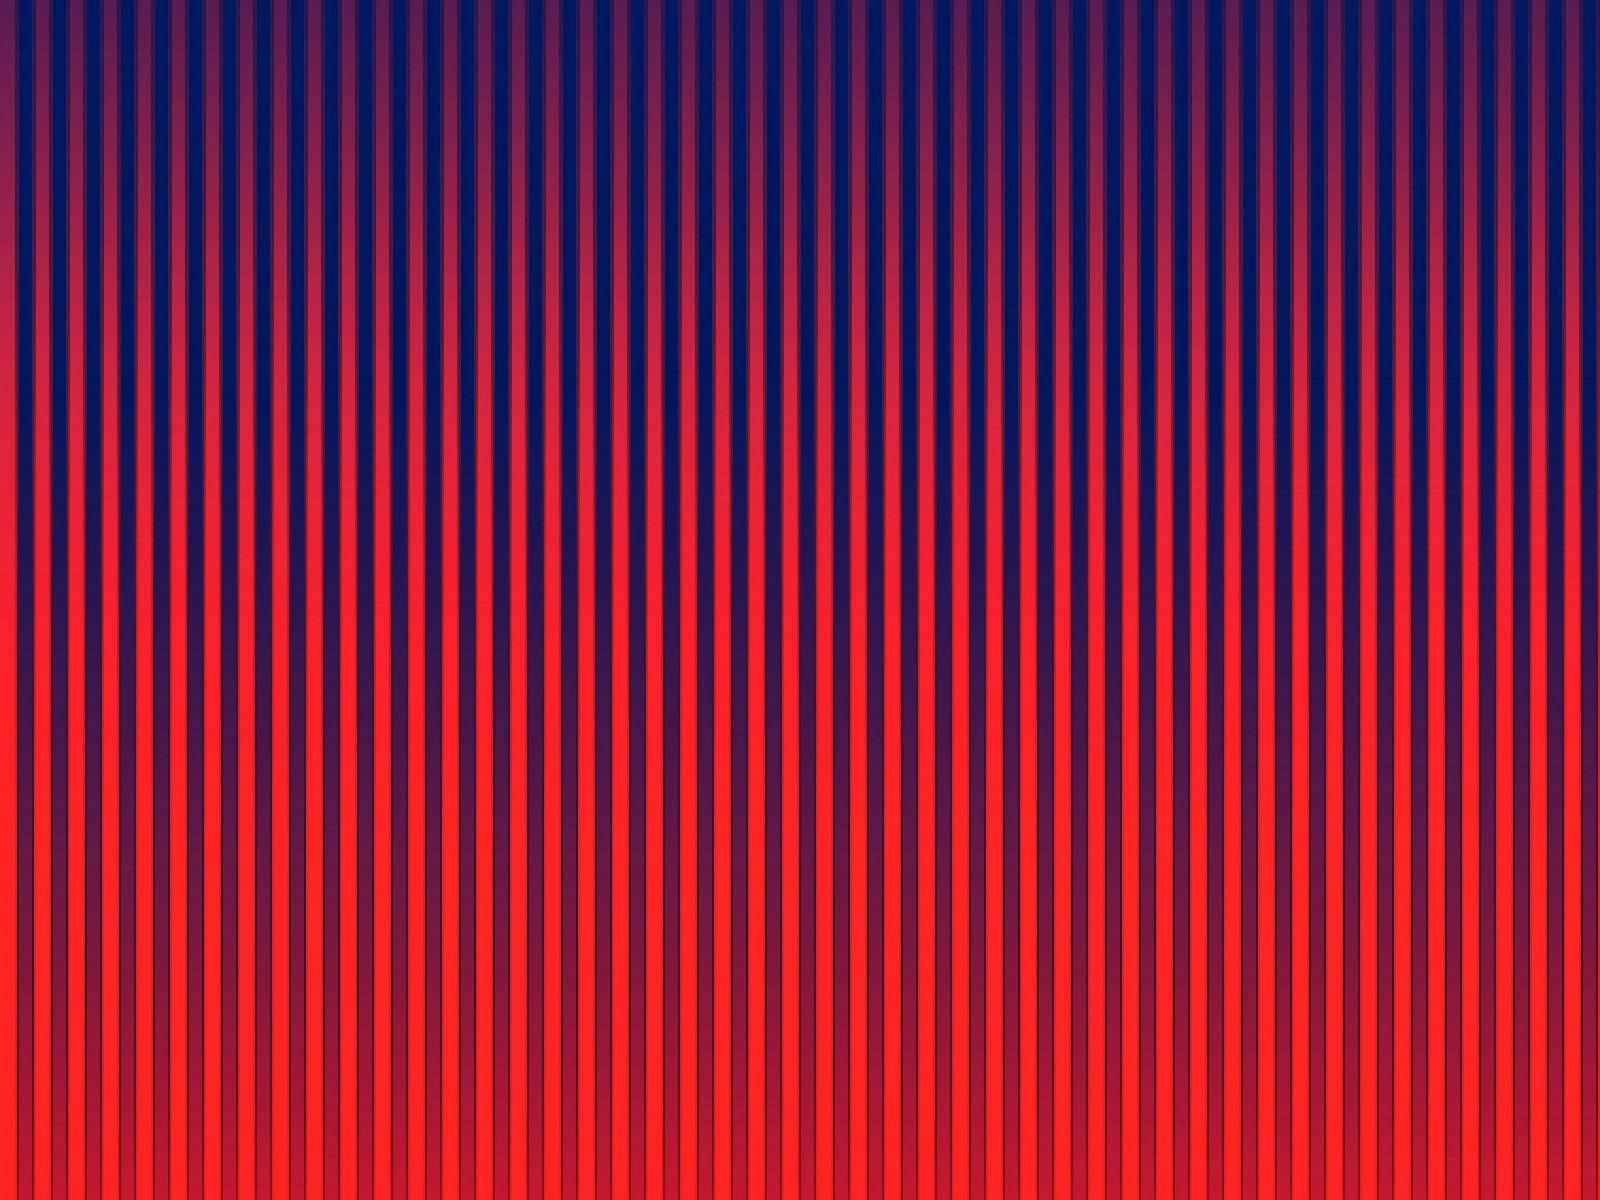 Blue Striped Wallpaper: Navy Blue Stripe Wallpaper